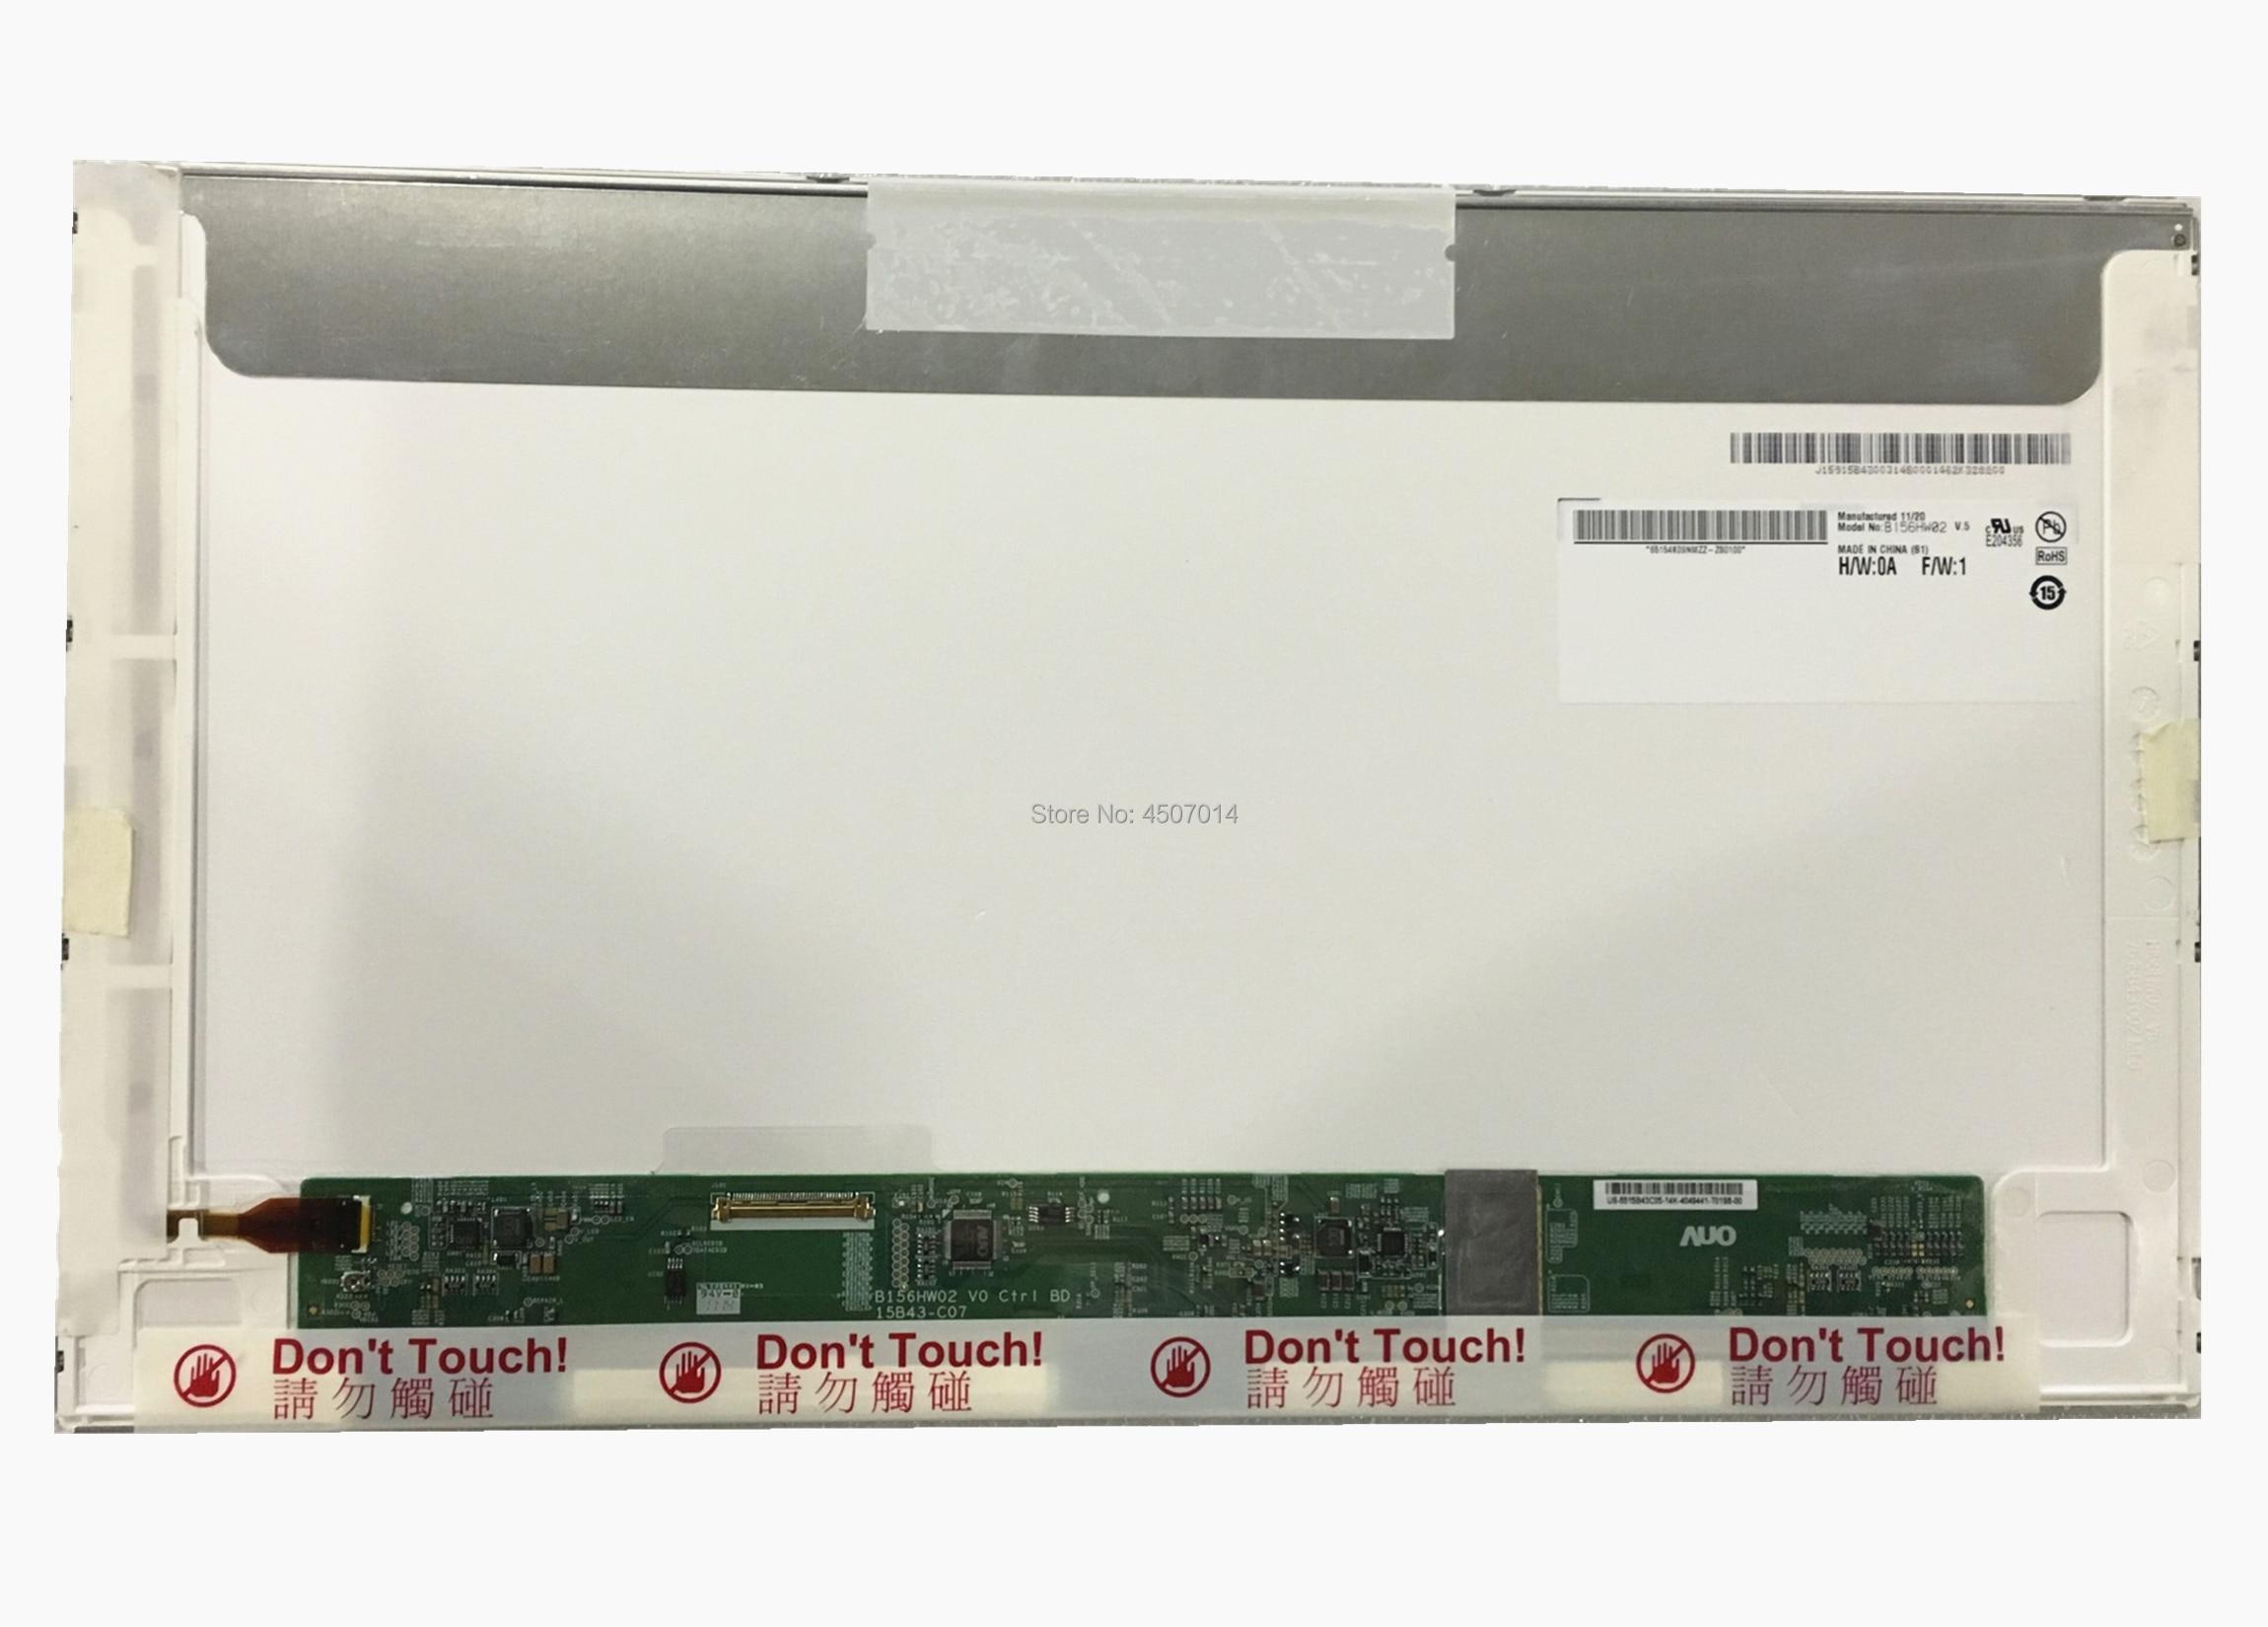 Livraison Gratuite B156HW02 V.5 B156HW01 V0 B156HW01 V0 V1 V2 V3 B156HTN01.0 B156HTN01.1 écran lcd d'ordinateur portable 1920*1080 LVDS 40PINS